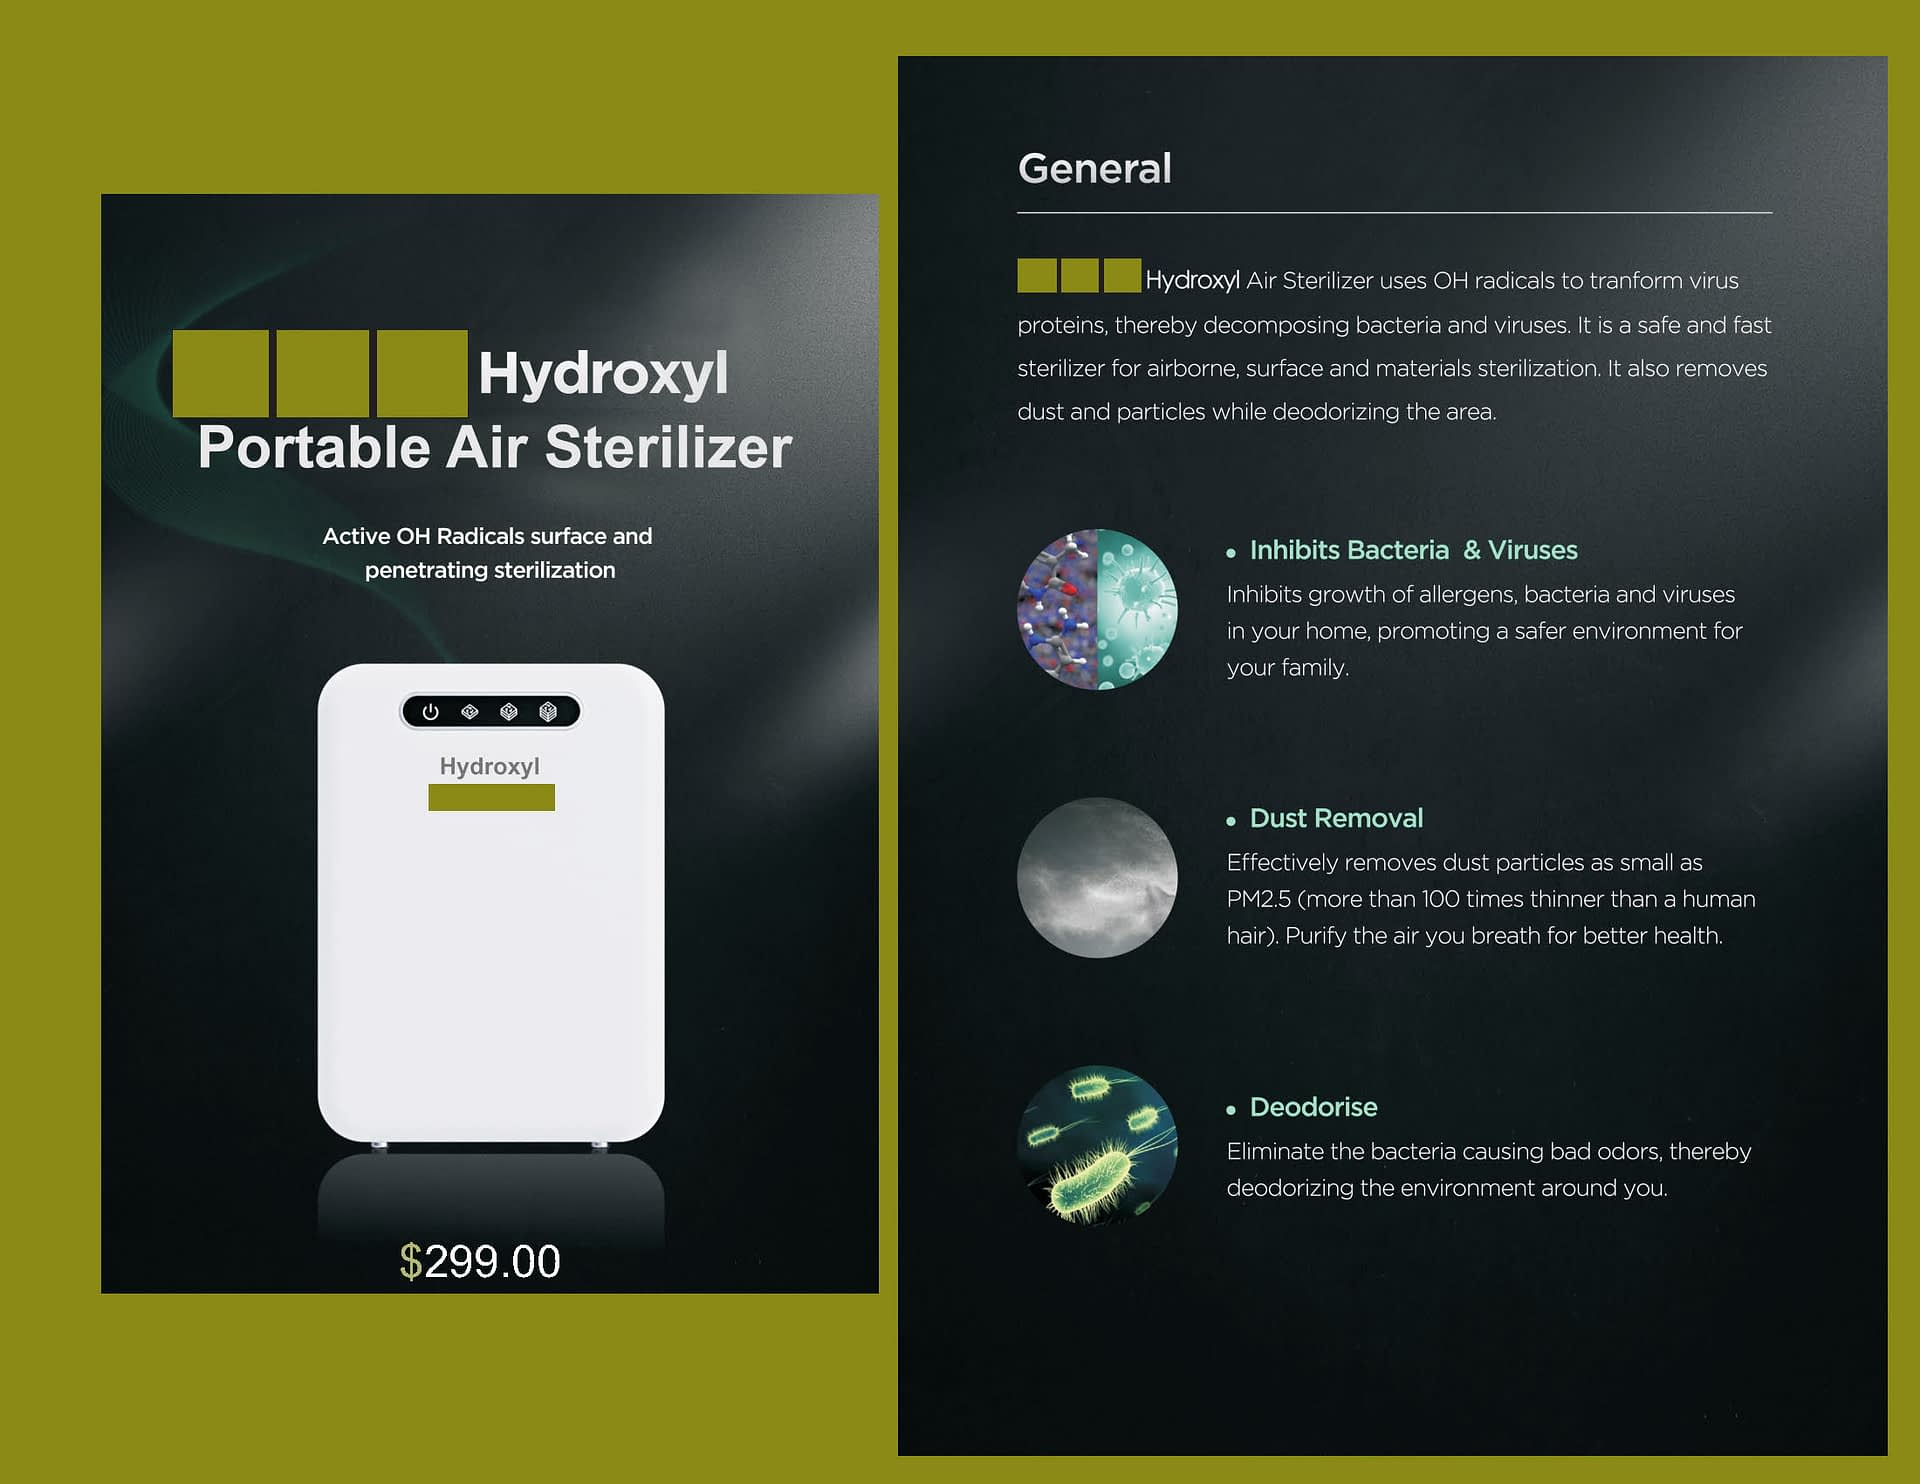 Portable air sterilizer